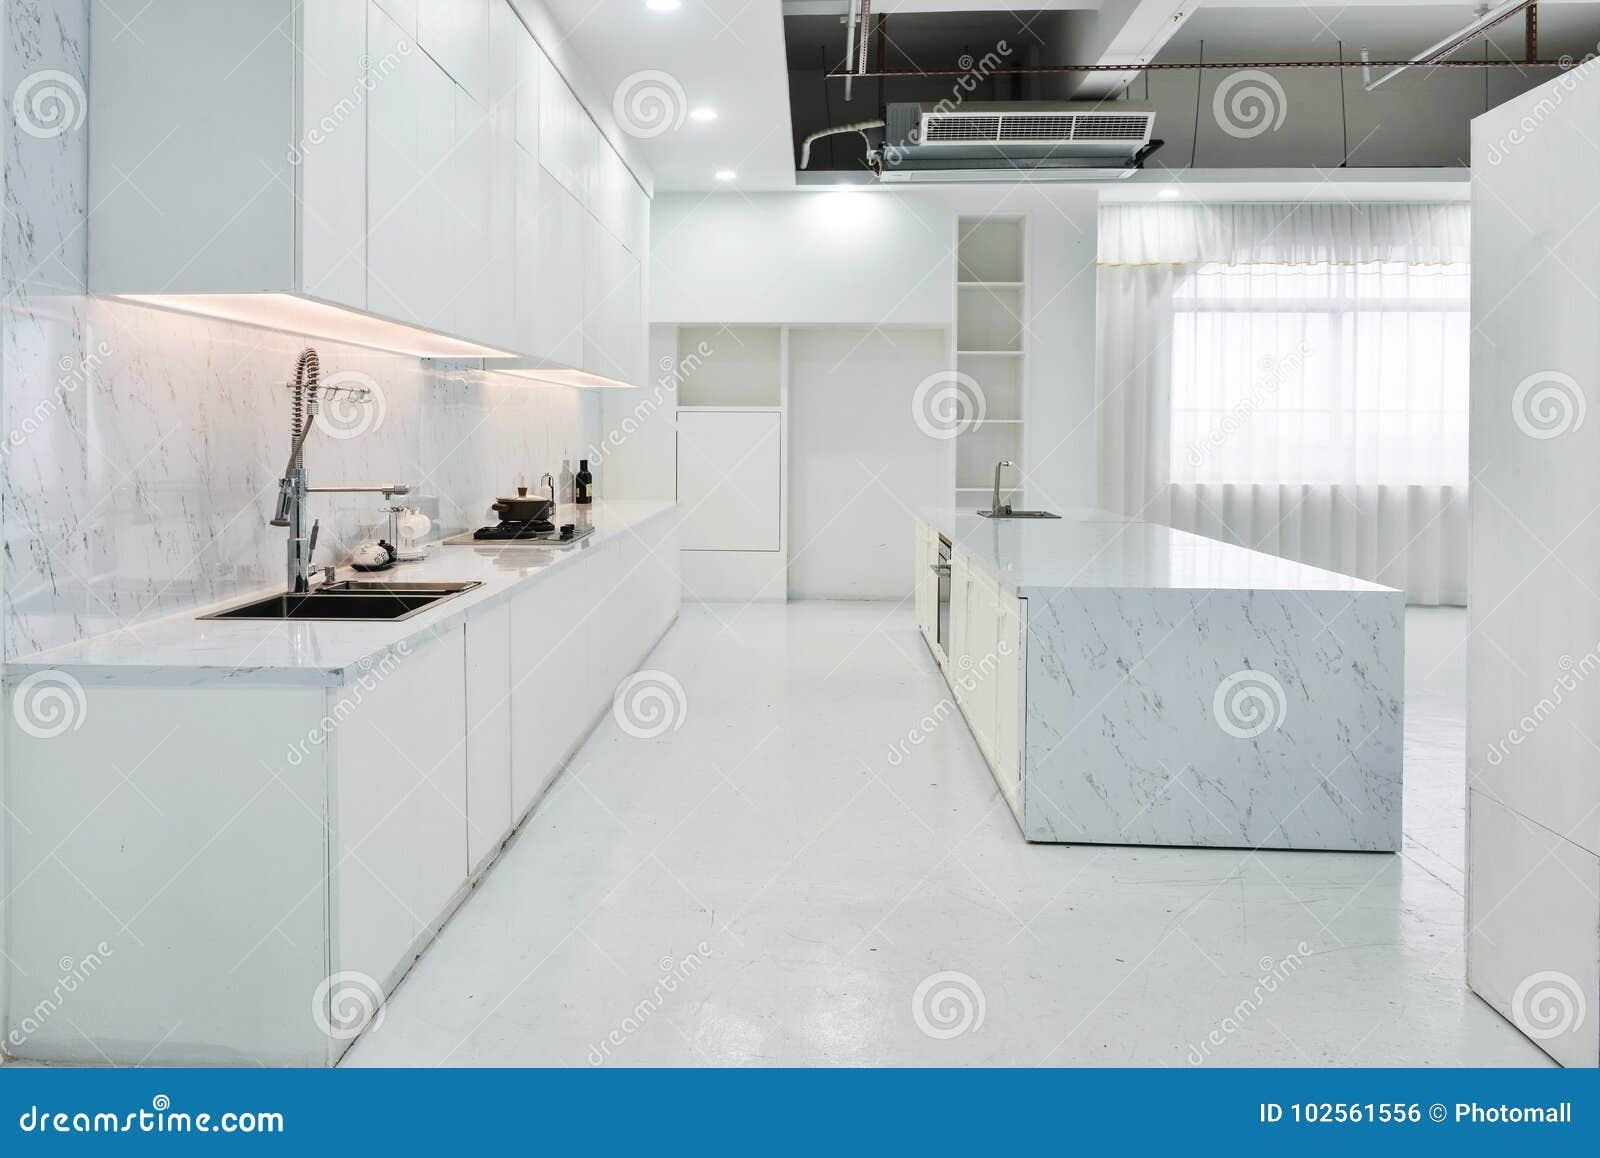 Cozinha aberta moderna